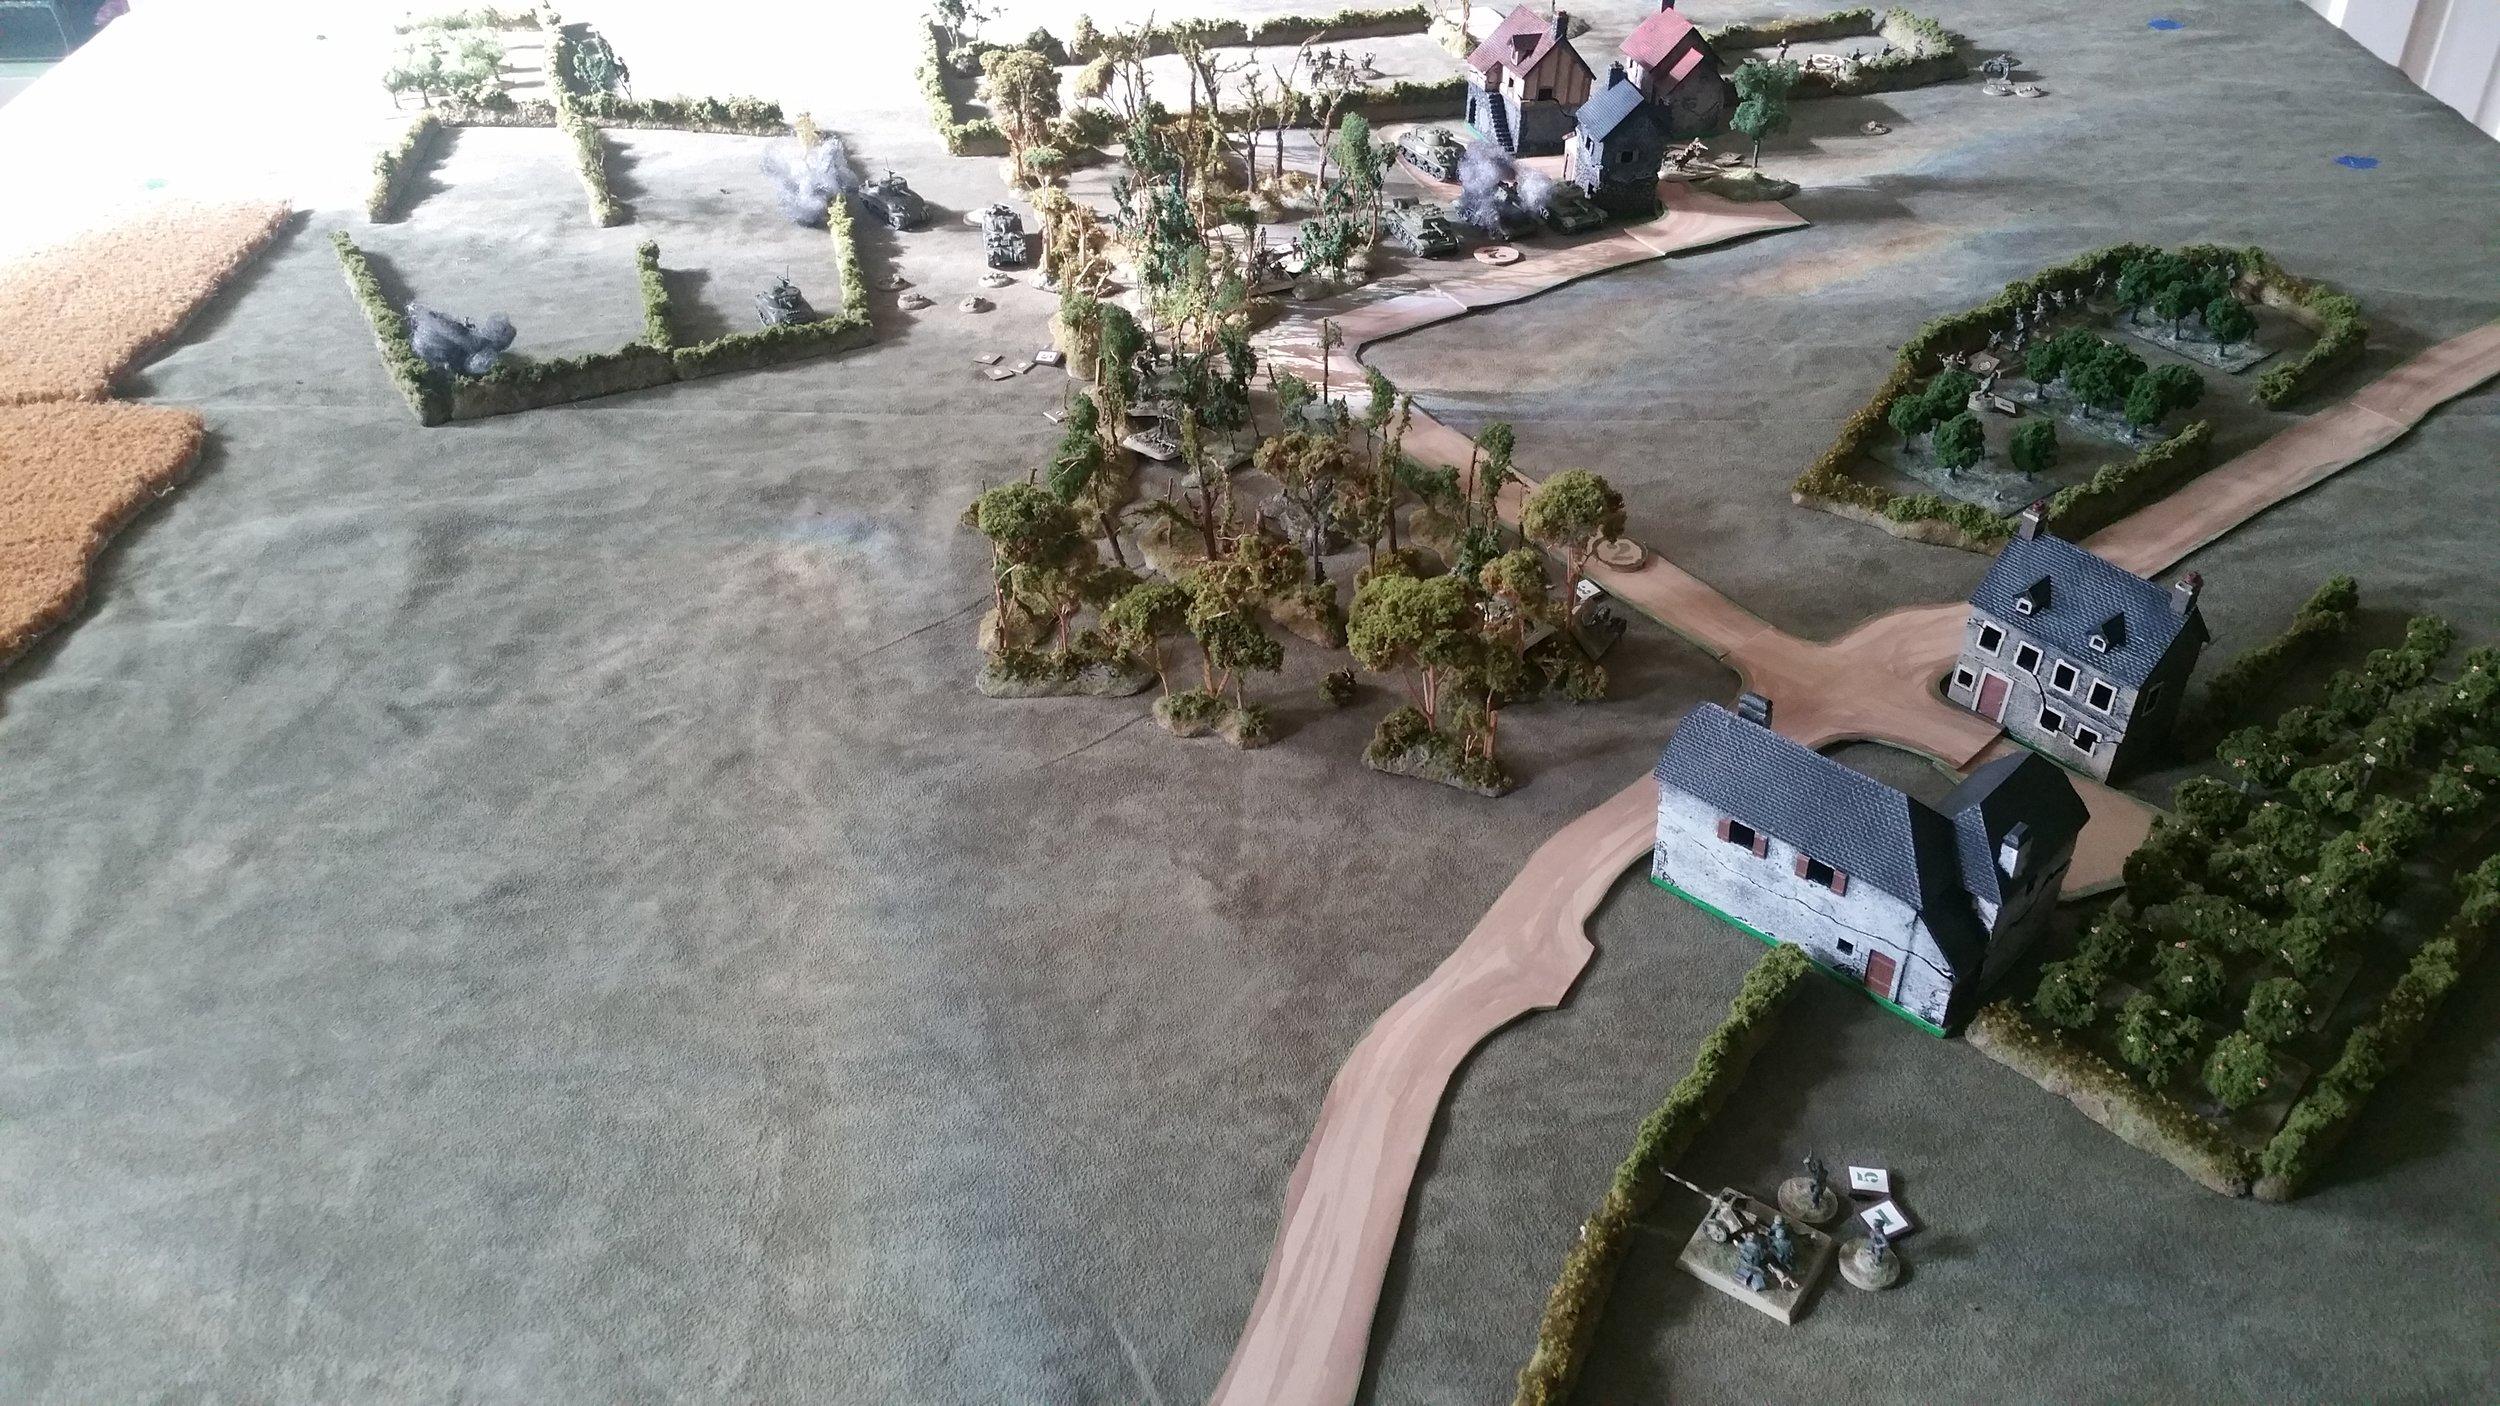 Pak 40 Halts the Shermans